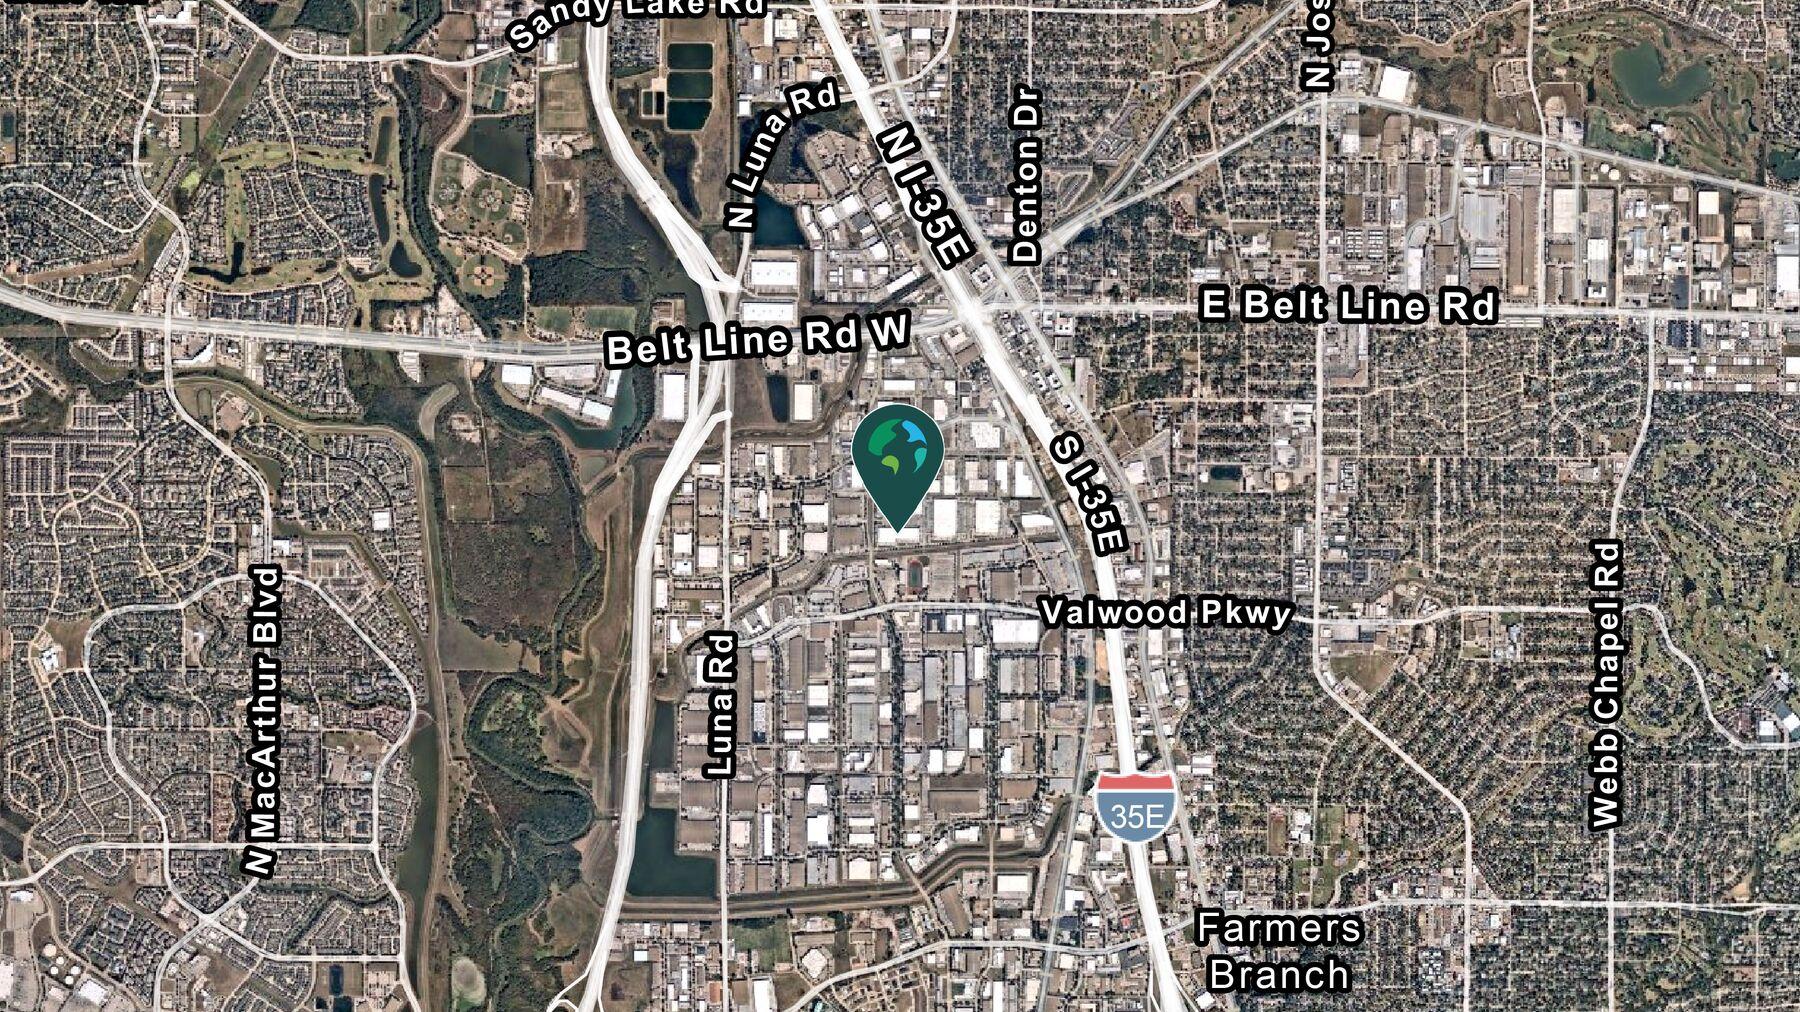 DPM-Prologis-Valwood-Corporate-Center-2-DAL03902-1621-Hutton-Drive_AerialMap.jpg